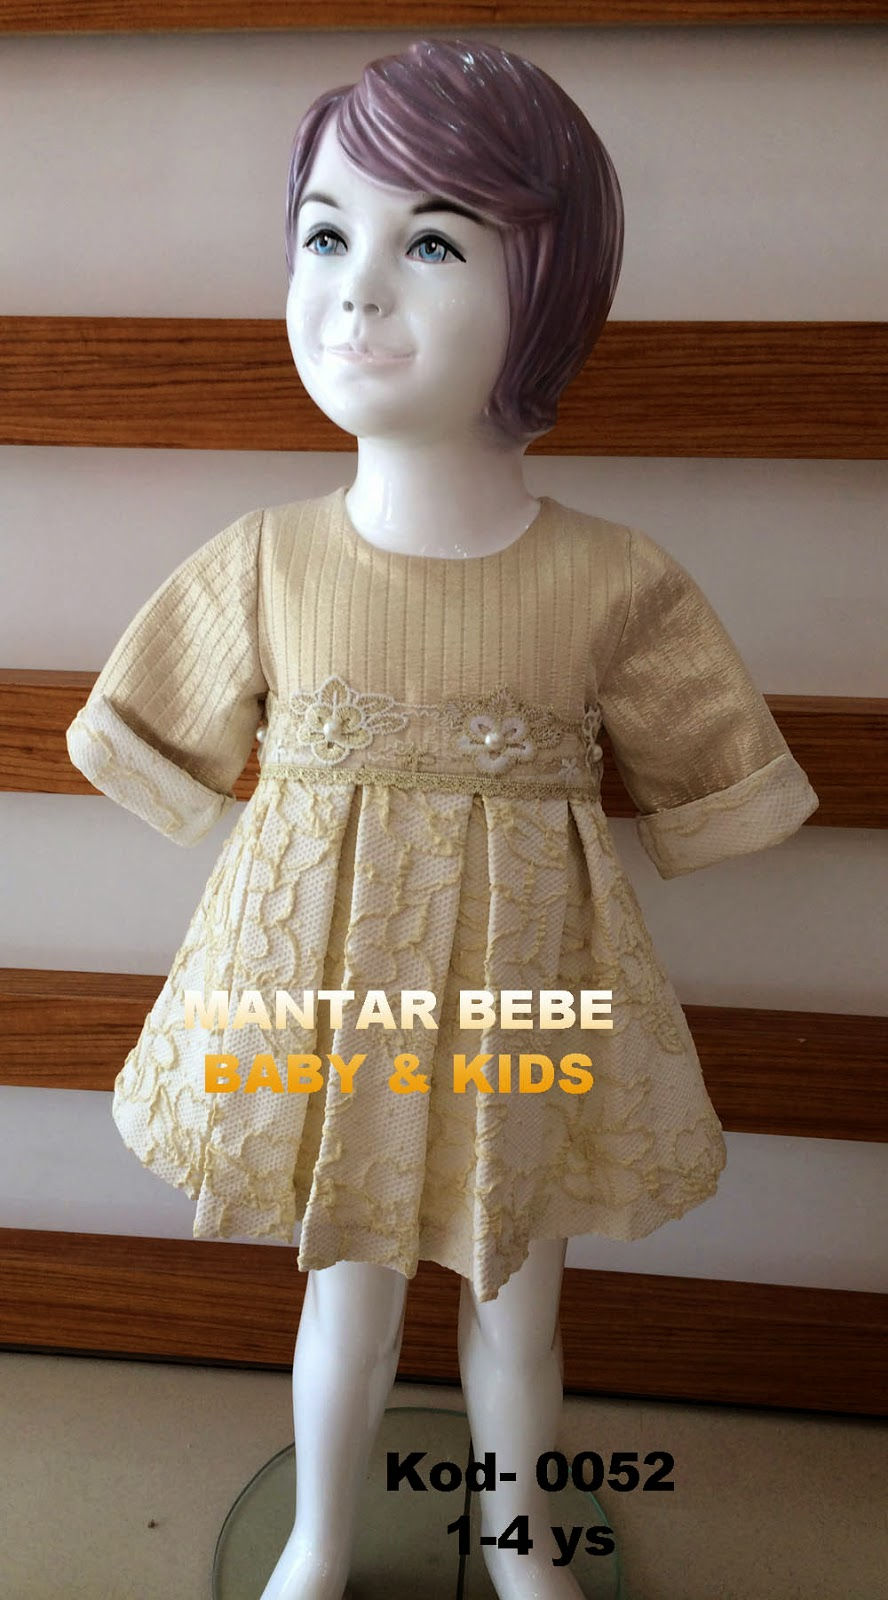 MANTAR BEBE ÇOCUK GİYİM - KOD052